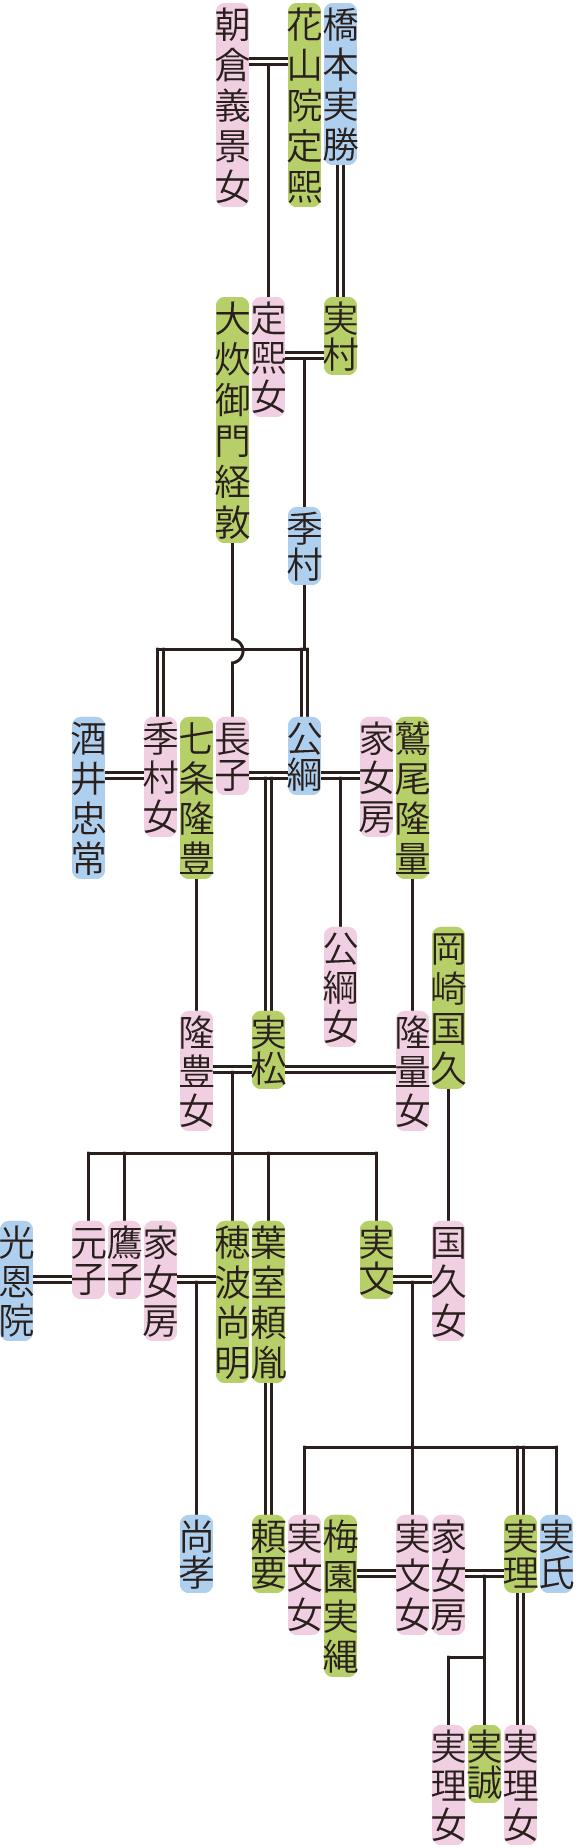 橋本季村~実文の系図